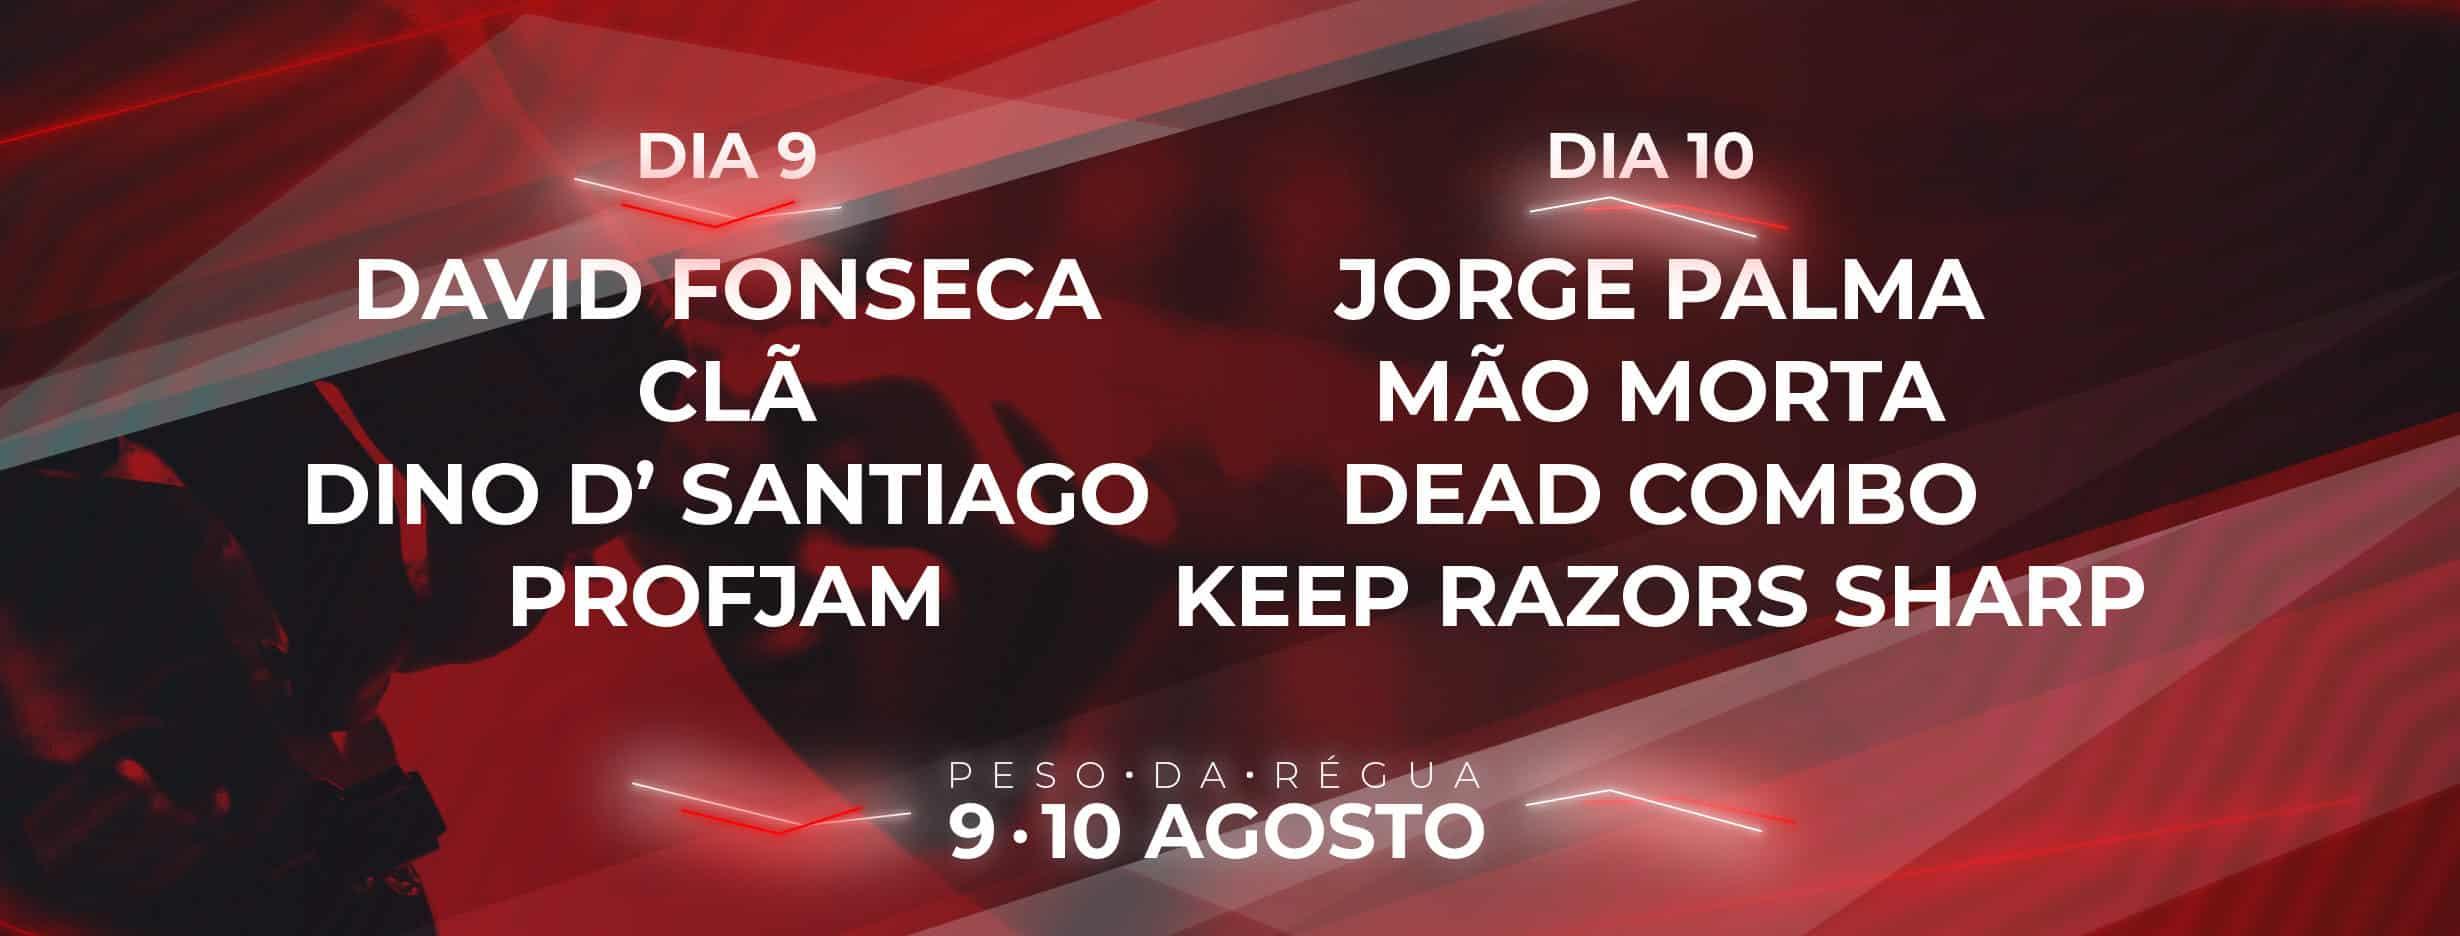 douro rock cartaz